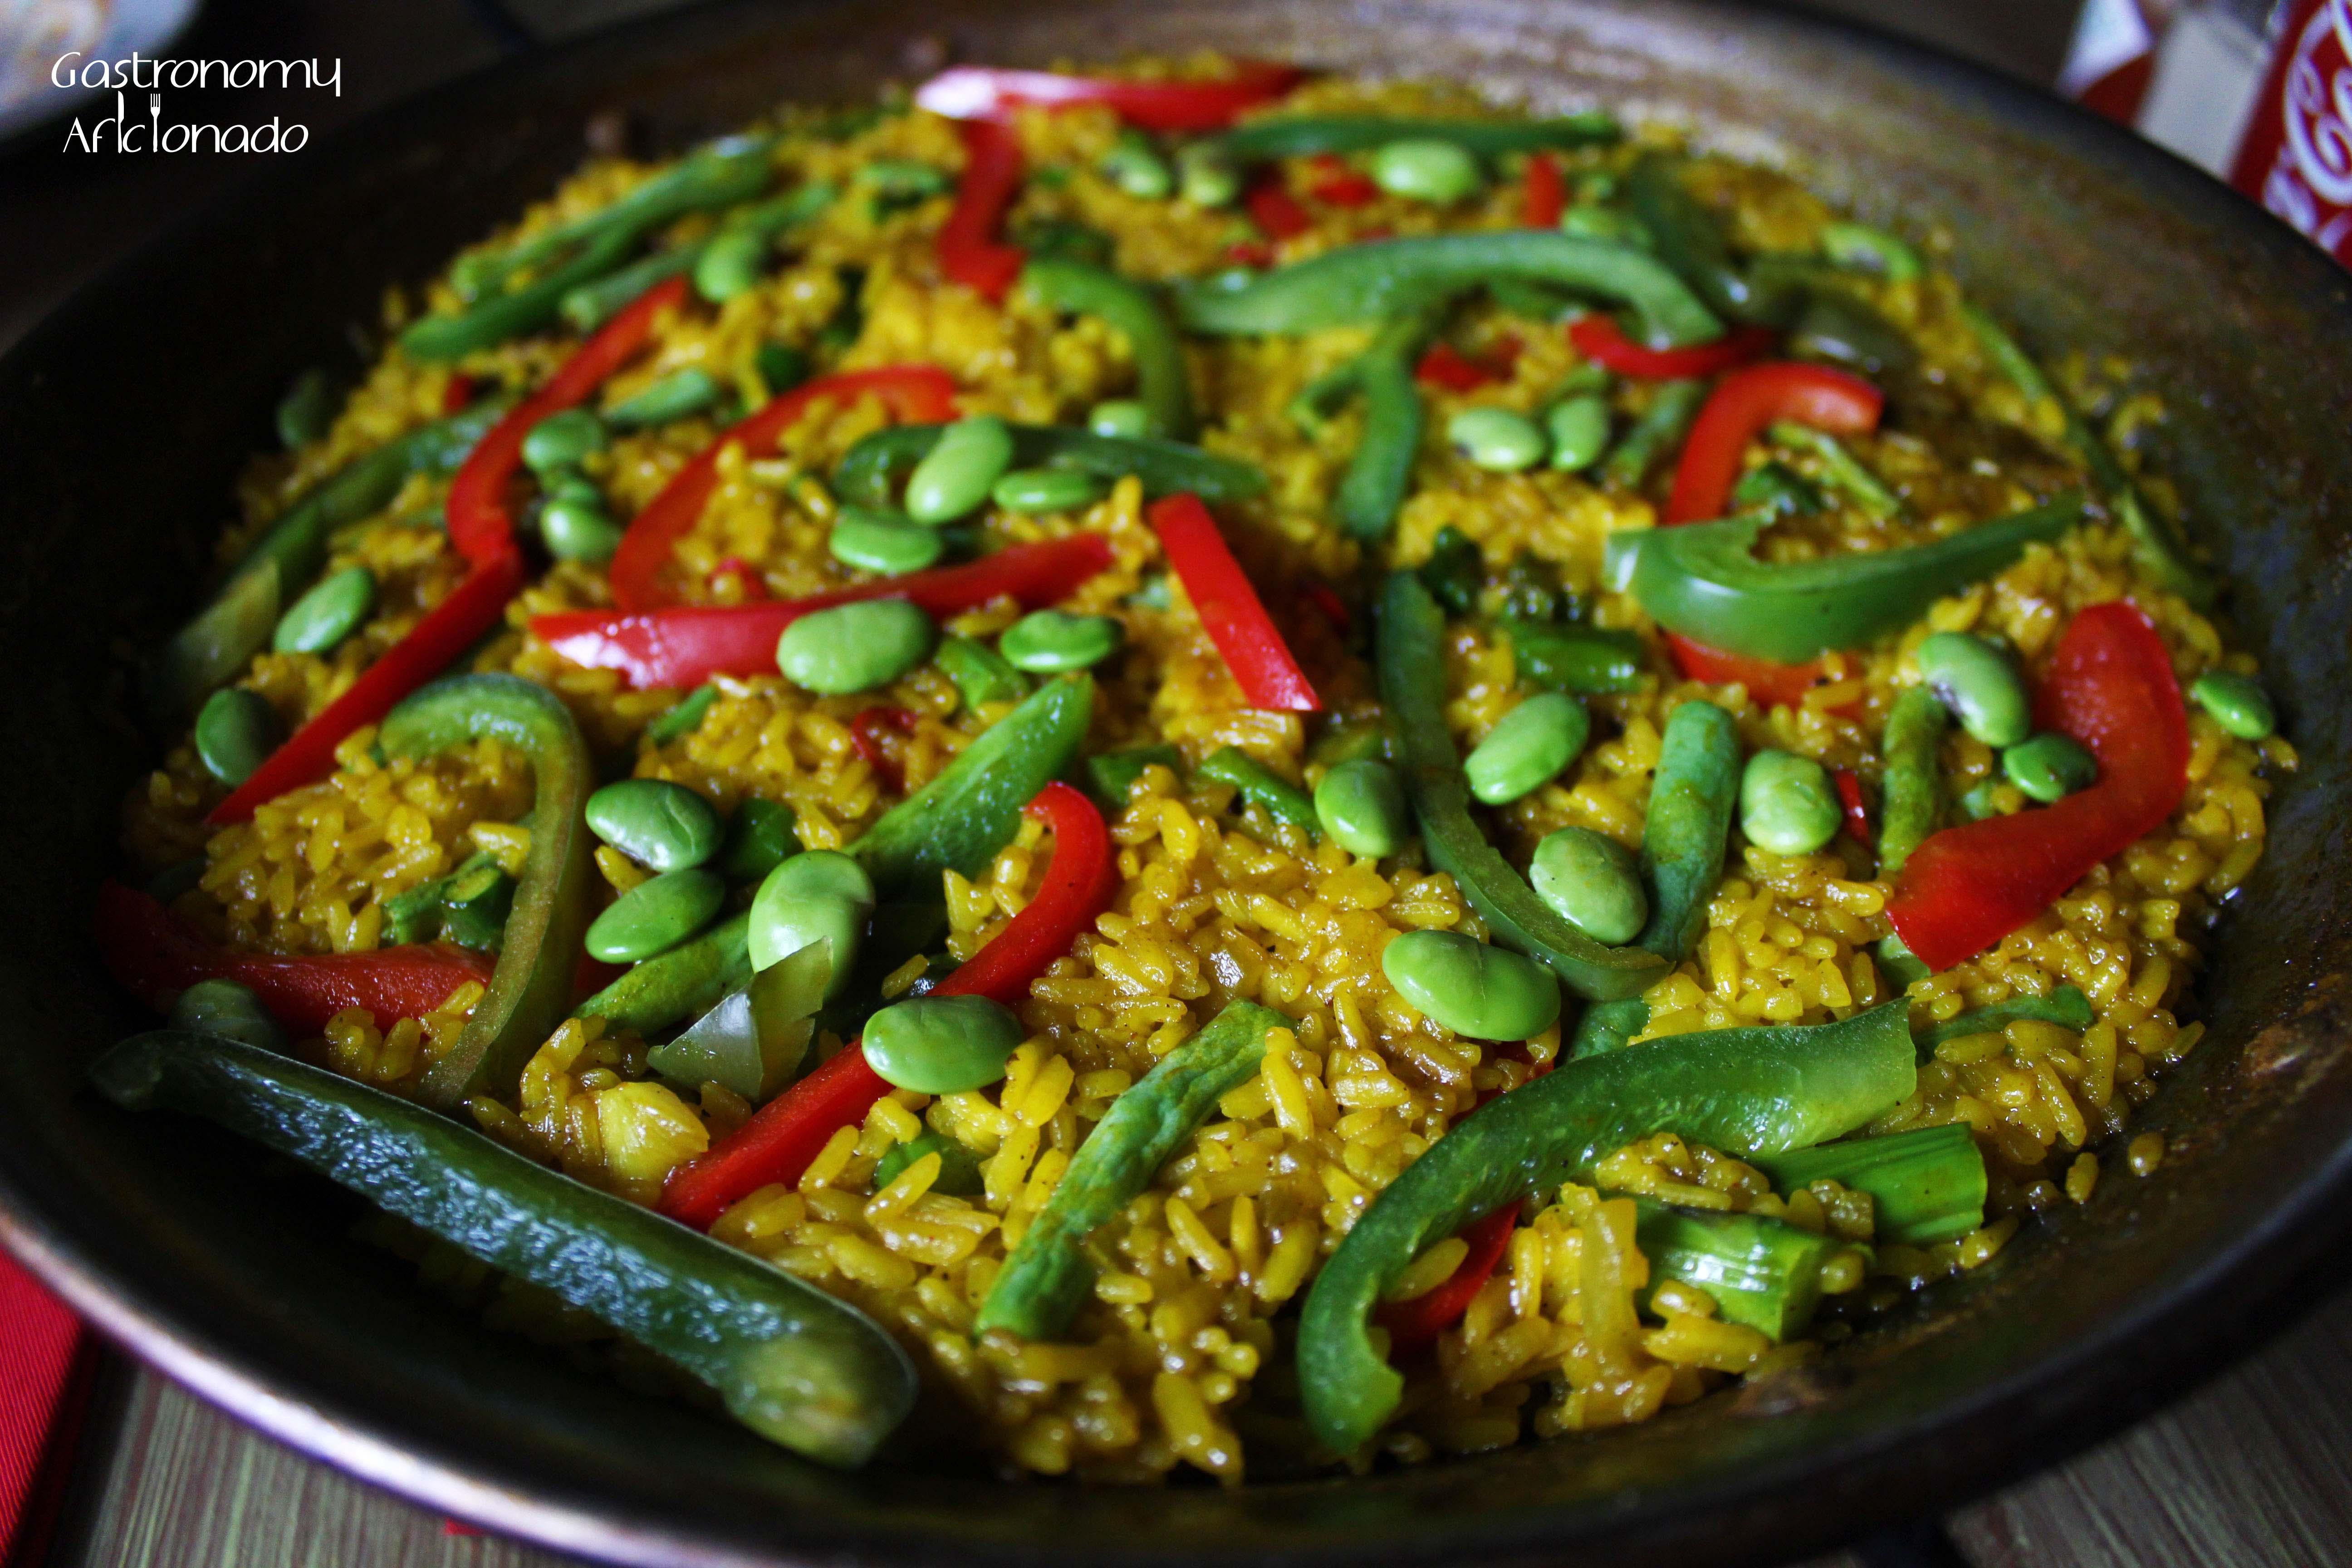 tapas movida � paella vegetariana the gastronomy aficionado